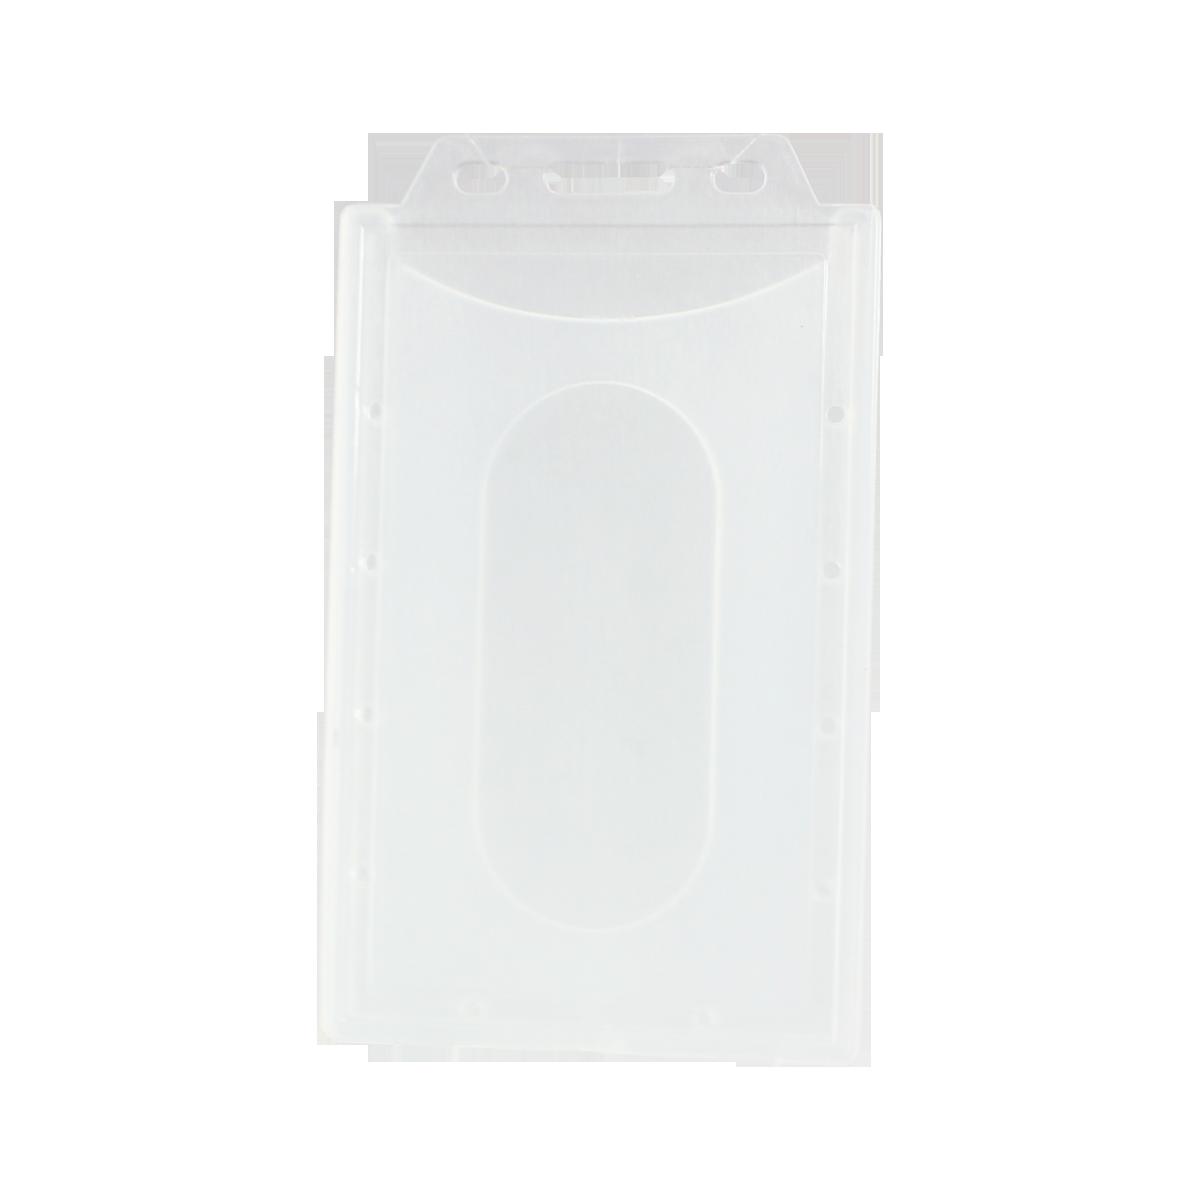 A31/V Id holder